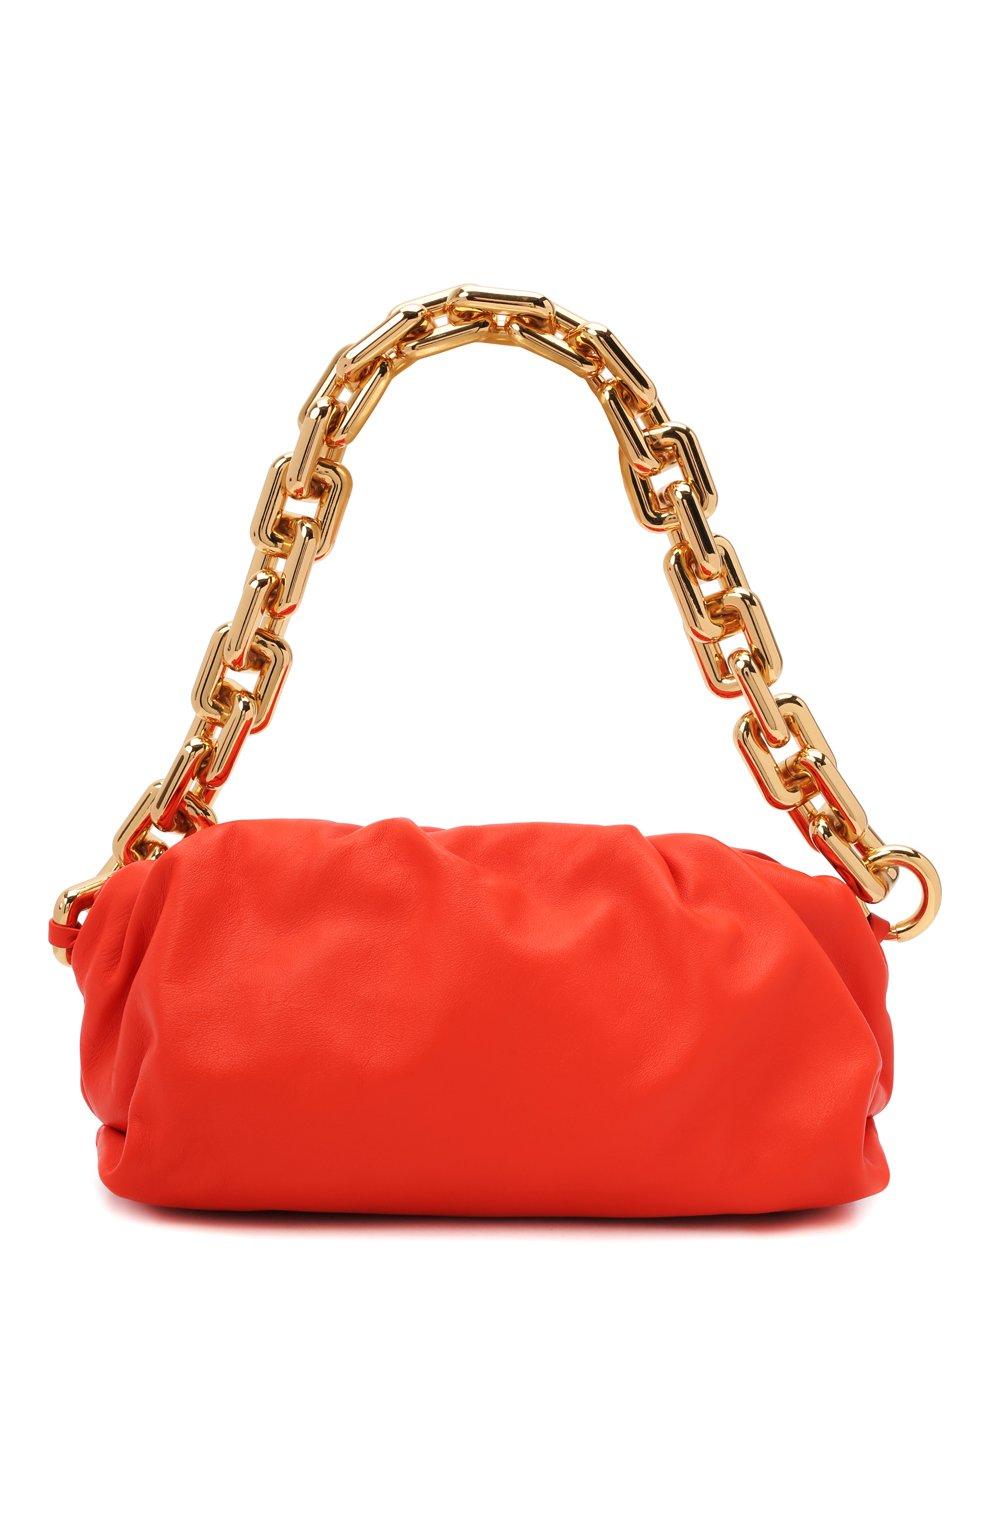 Женская сумка chain pouch BOTTEGA VENETA оранжевого цвета, арт. 620230/VCP40   Фото 1